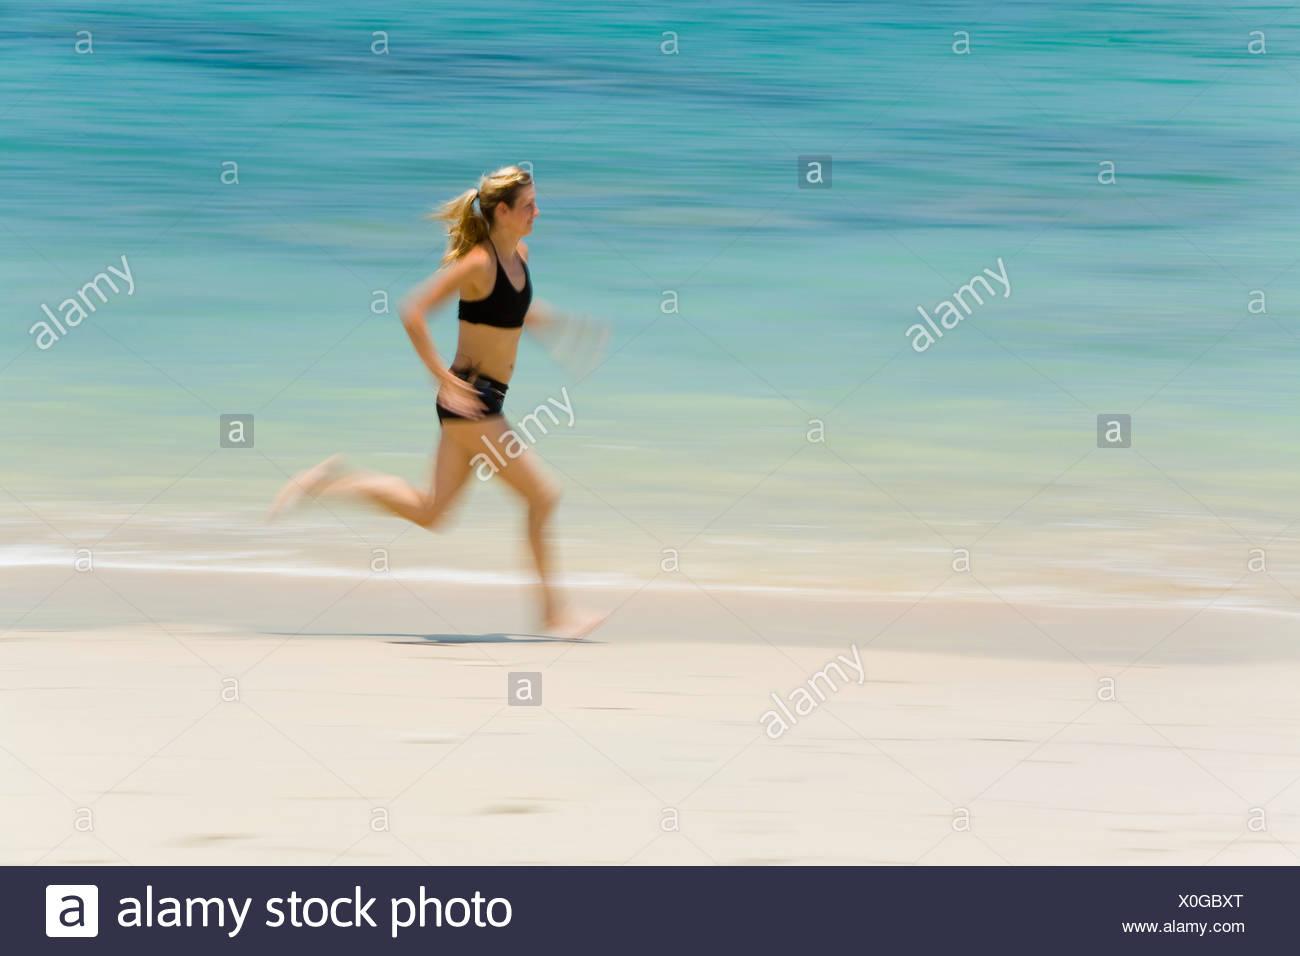 A Woman Tourist Runs Along The Beach On A Tropical Island; Koh Lanta,Thailand Stock Photo